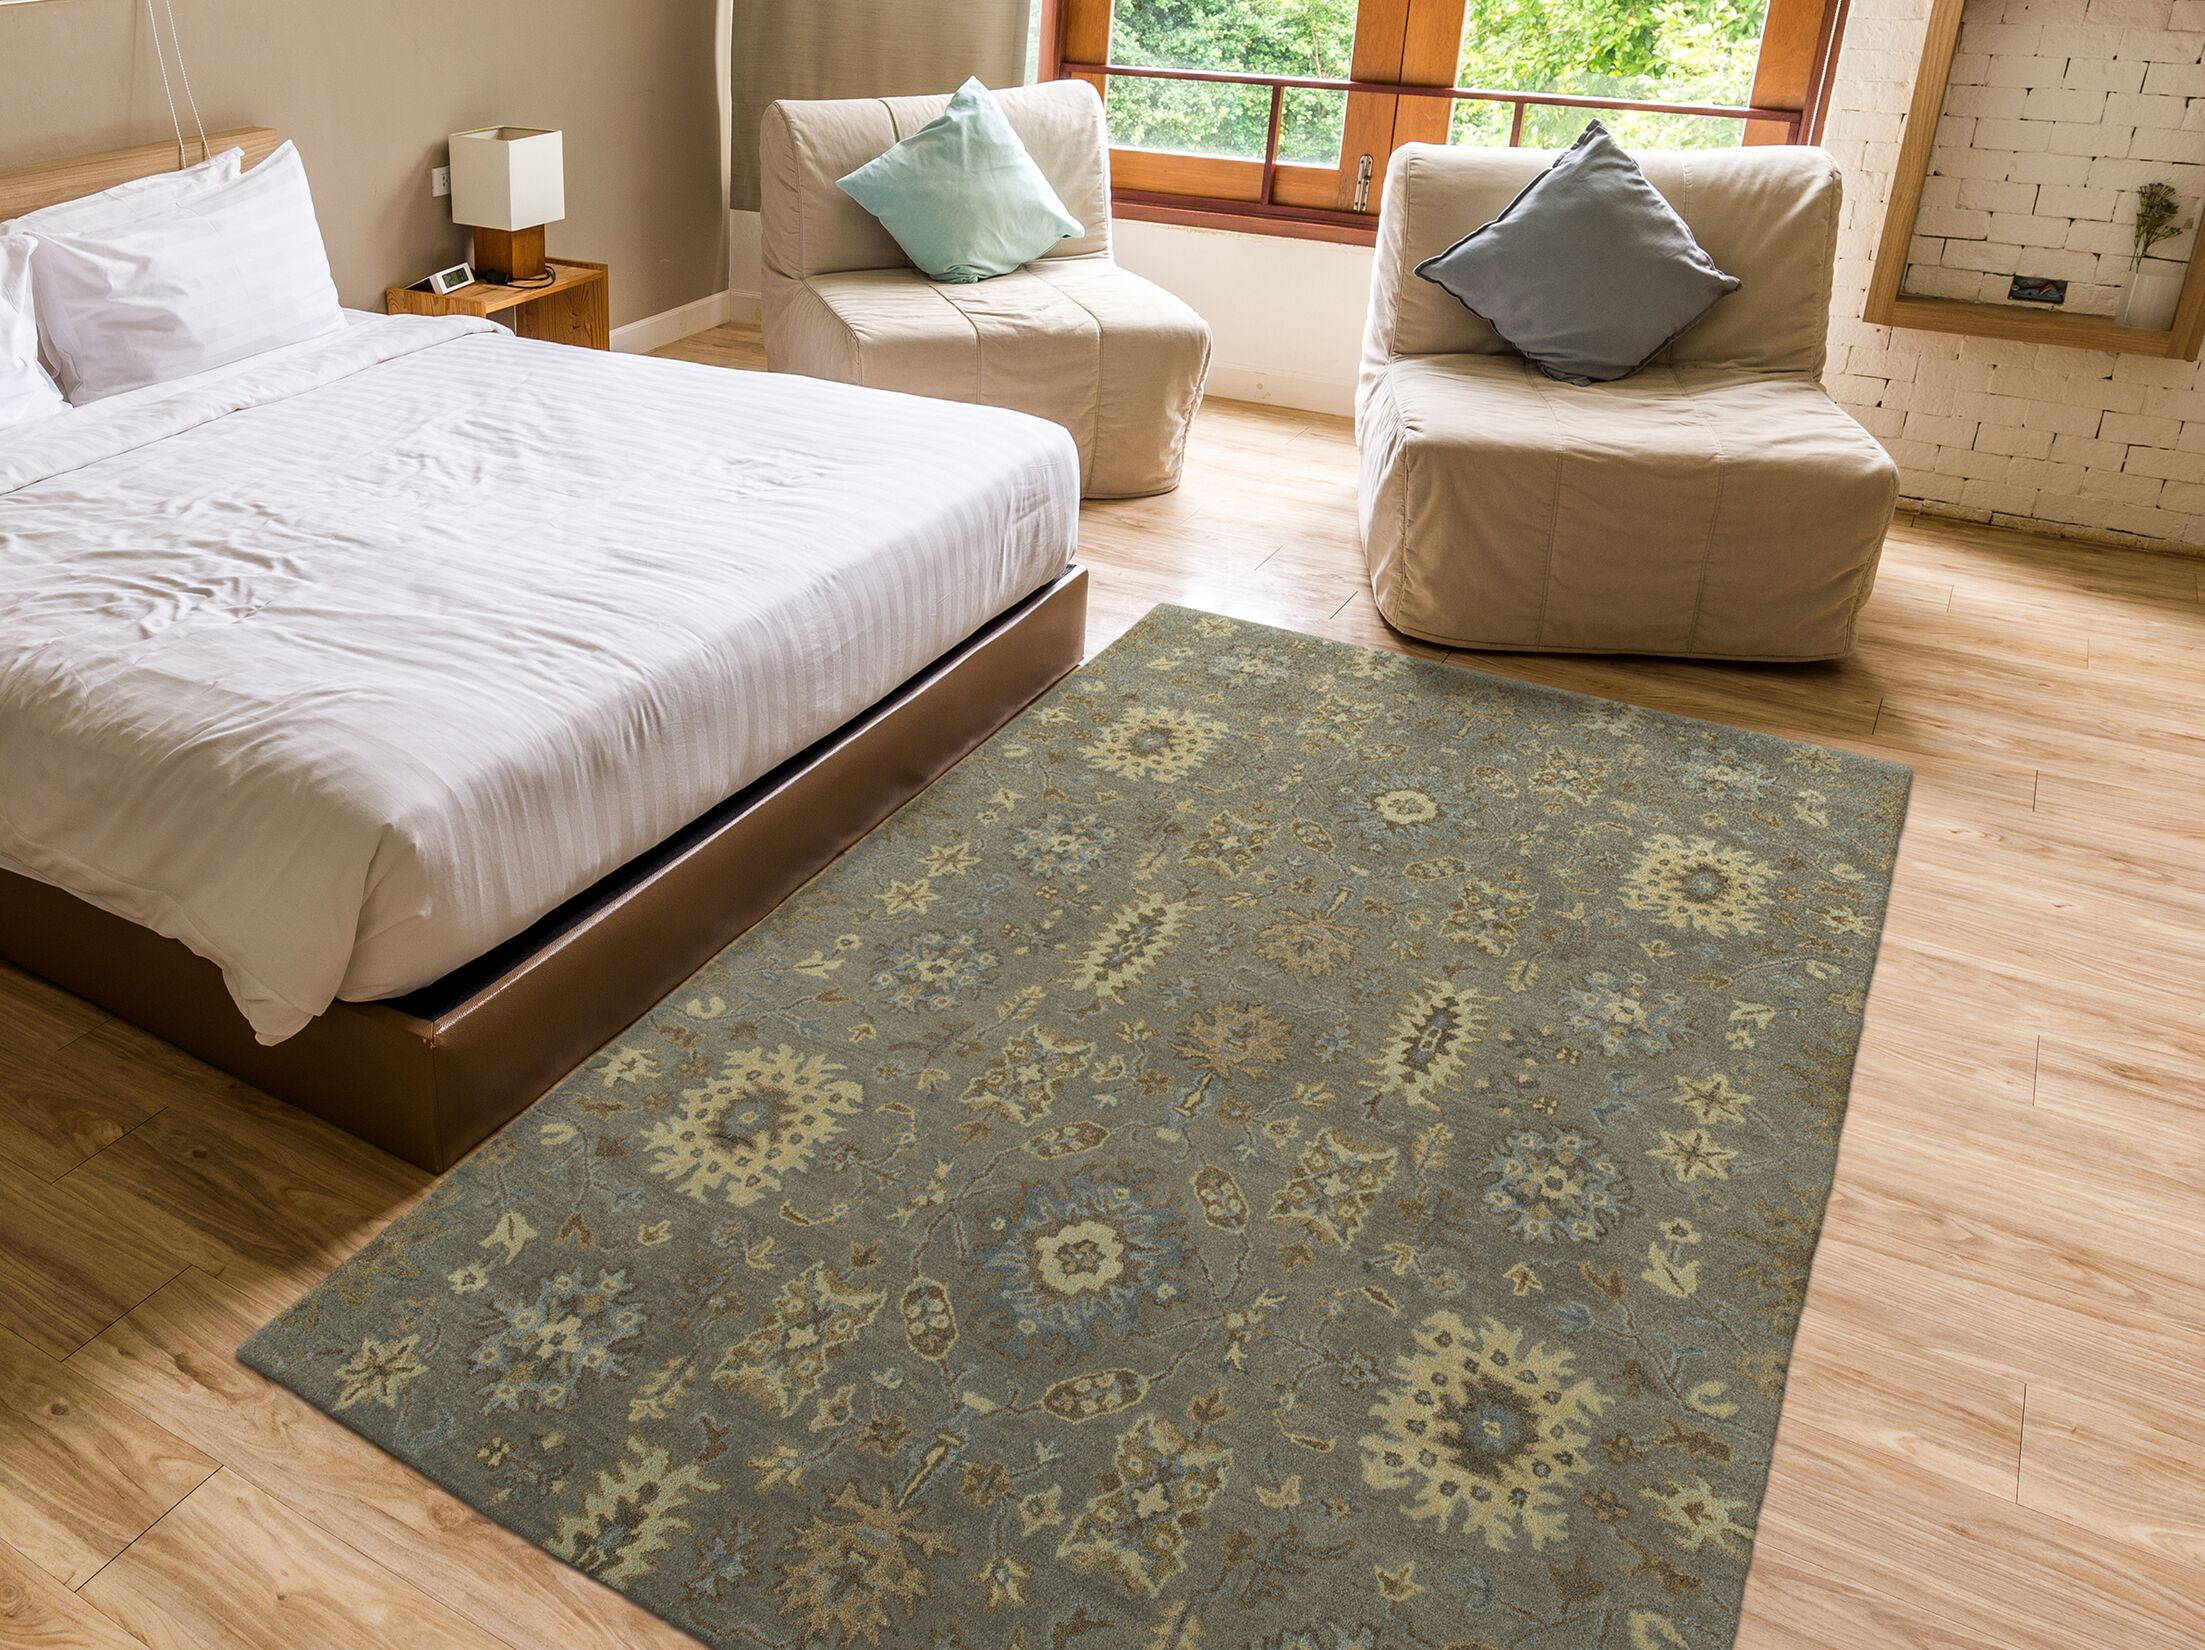 Romarin Hand-Tufted Wool Mushroom Area Rug Rug Size: Rectangle 4' x 6'